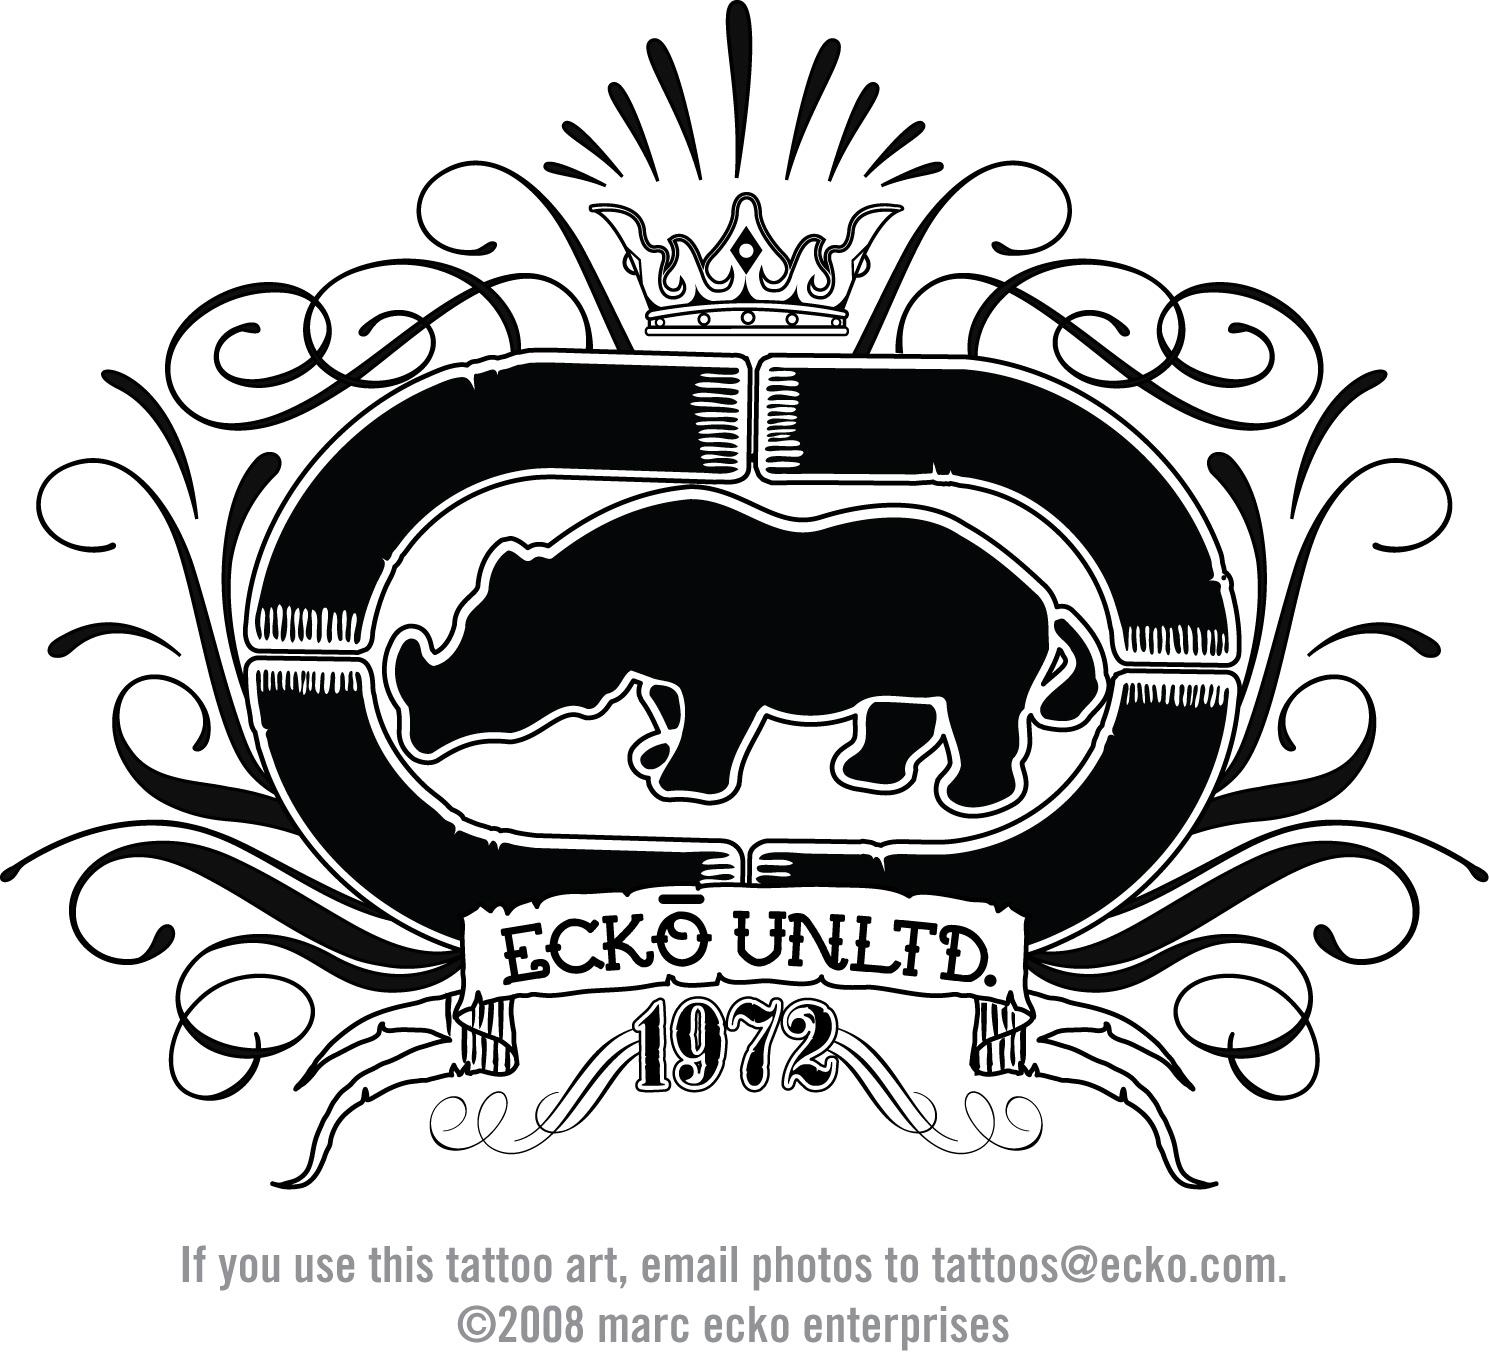 http://3.bp.blogspot.com/-rL2FdVlLj-Y/UC80dp_o6EI/AAAAAAAAAmo/niffRiboB1Q/s1600/ecko_unltd_tattoo-114.jpg